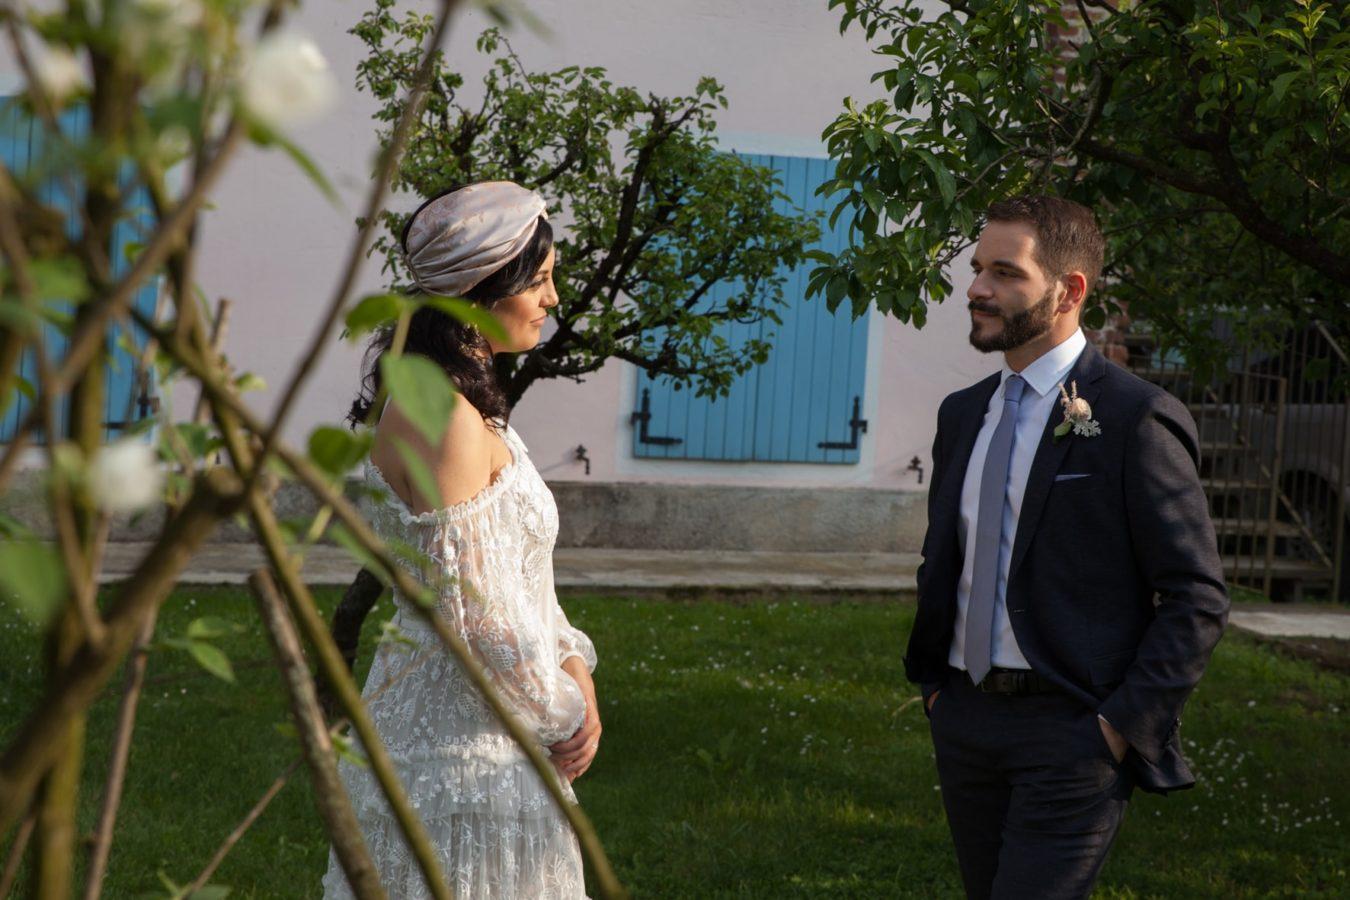 055 Irina e Fabio-min